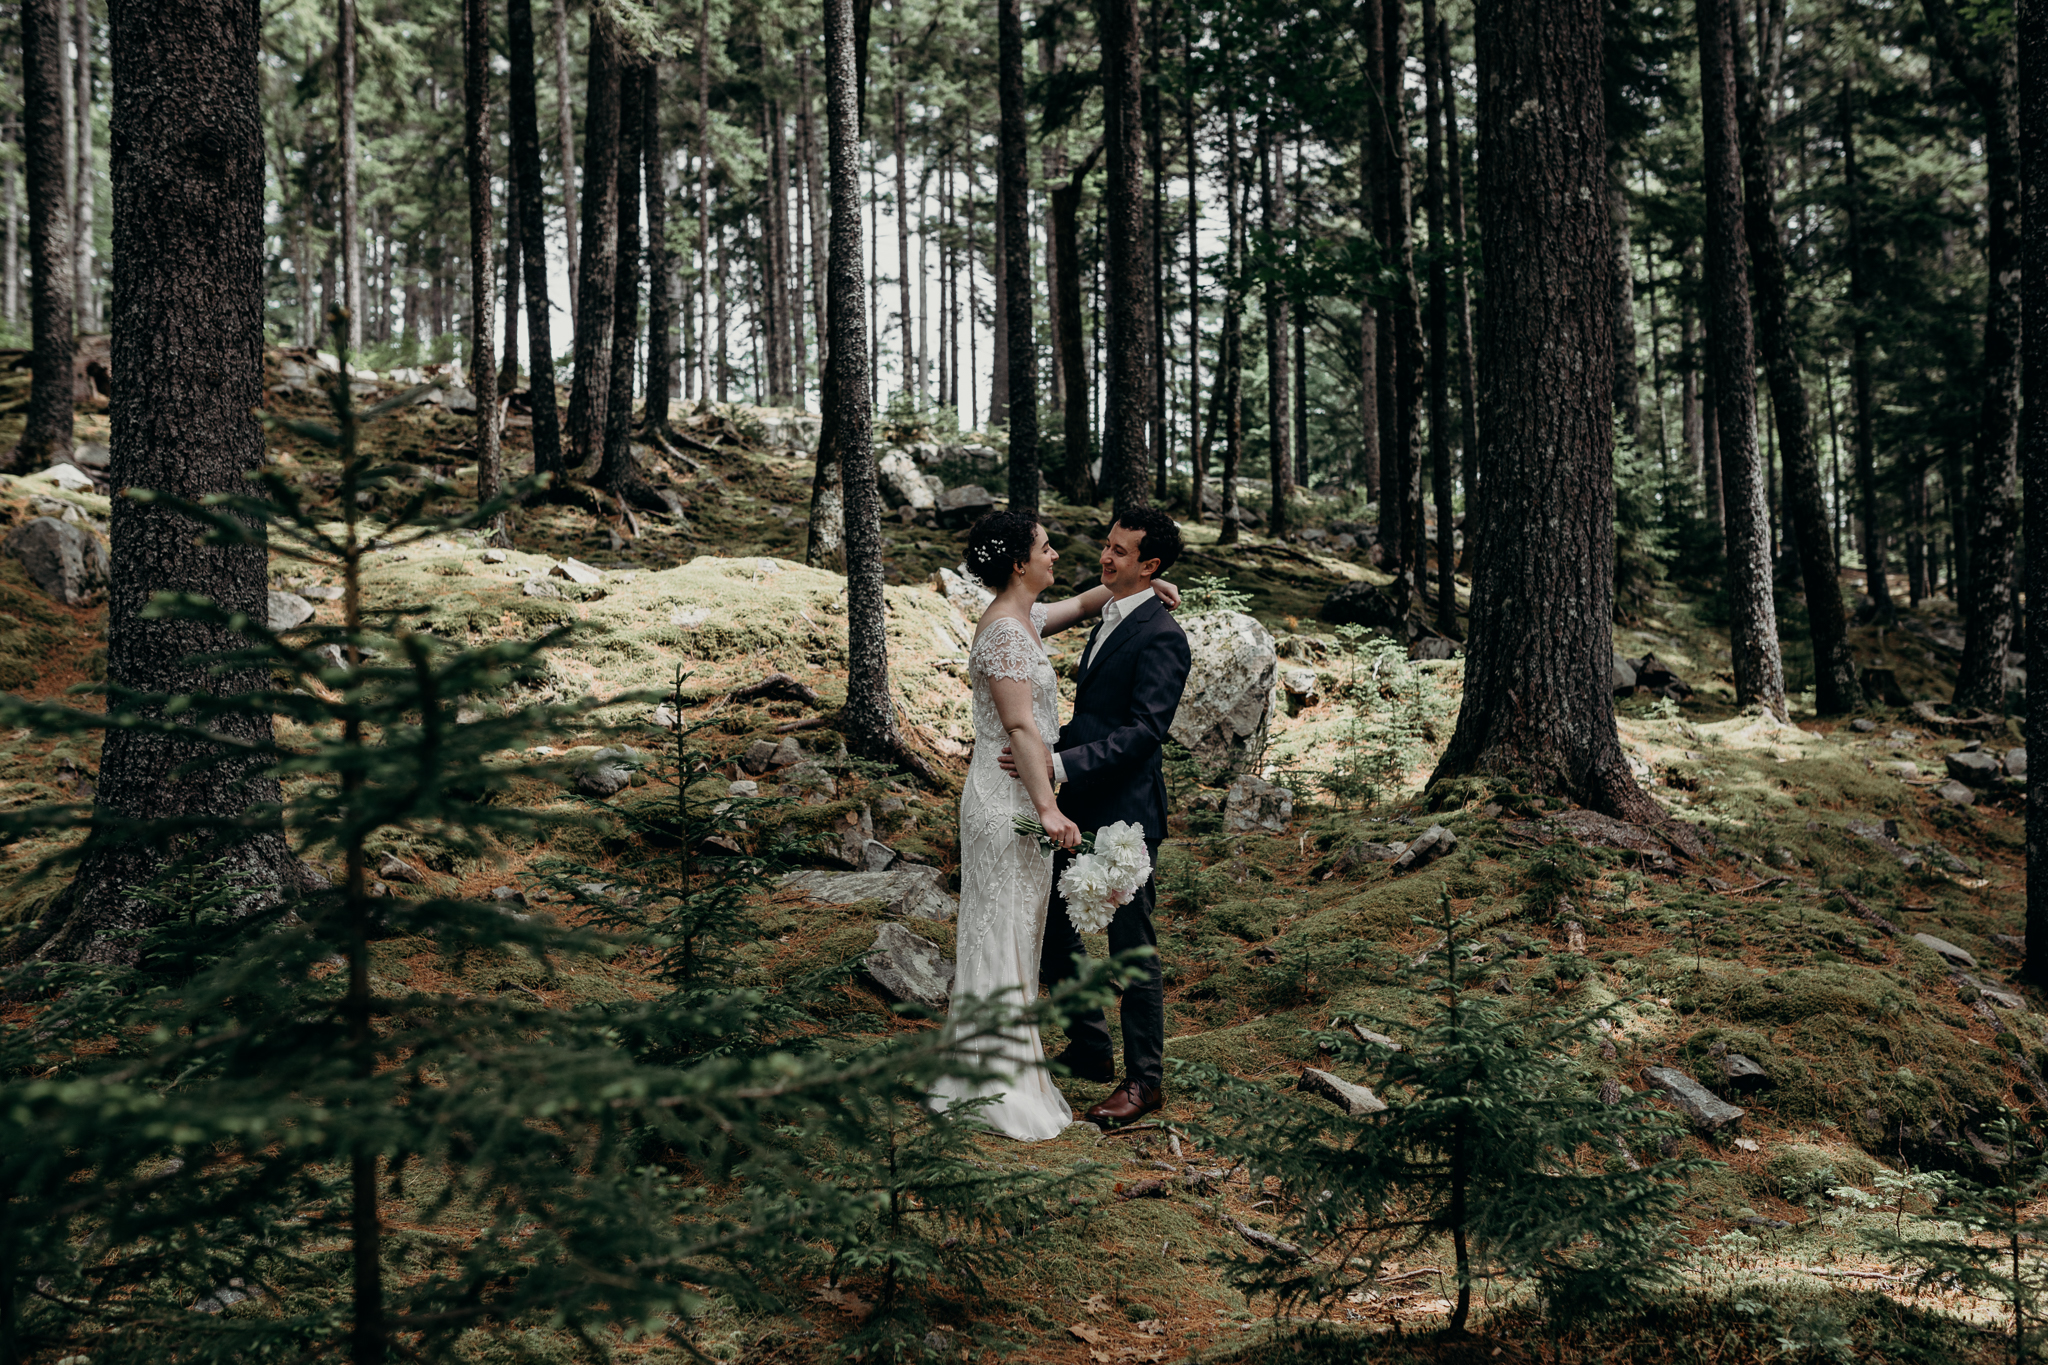 erinwheatco-9130 Maine Wedding by the Sea | Ruth & Ryan